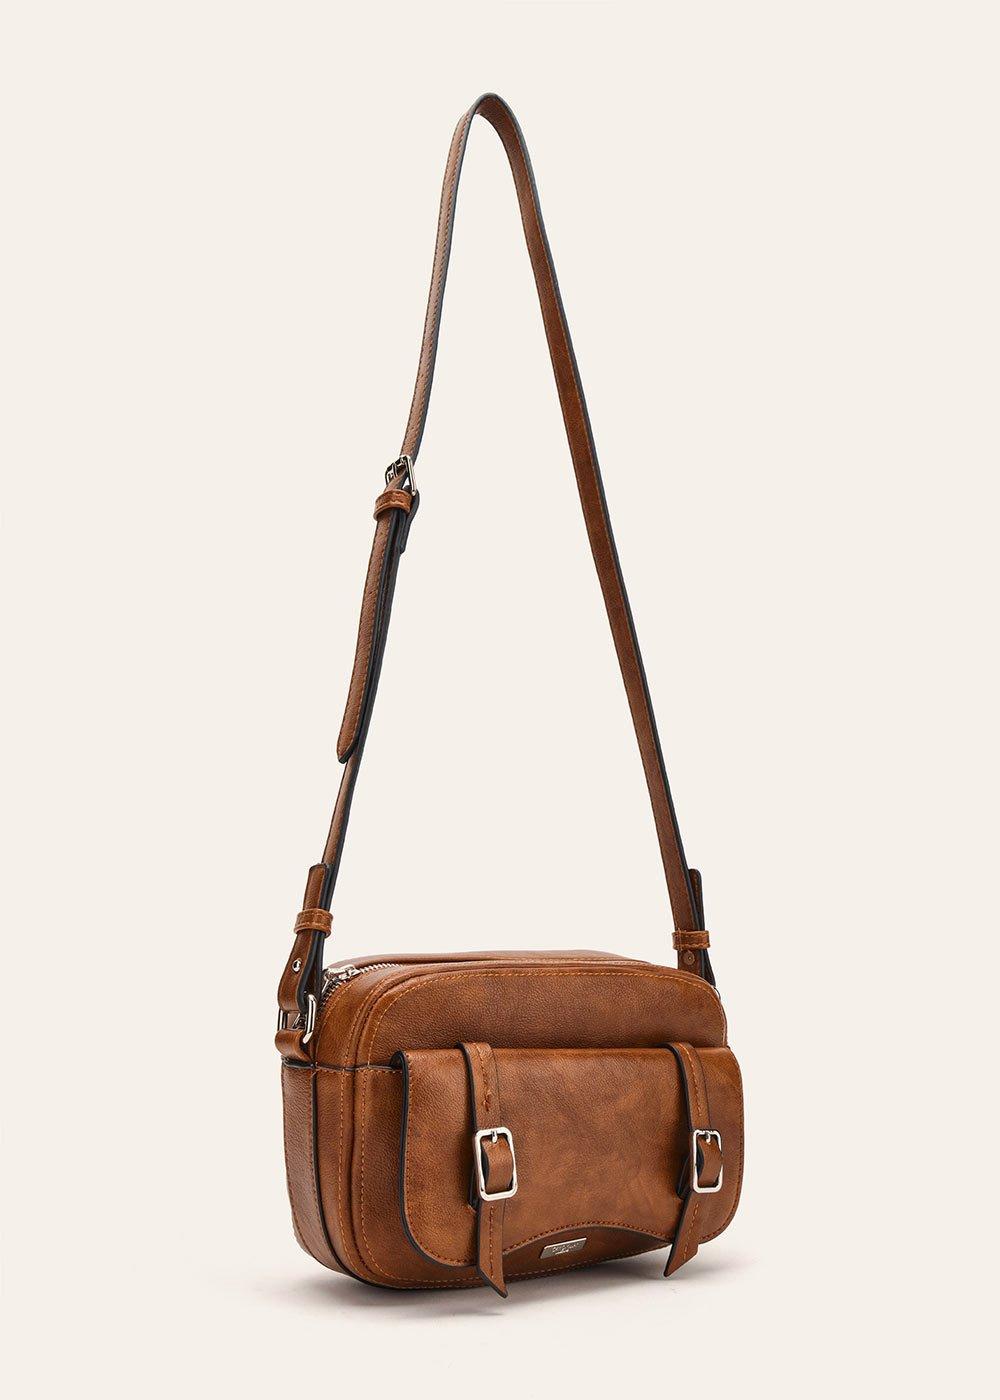 Belen shoulder bag with flap closure - Coccio - Woman